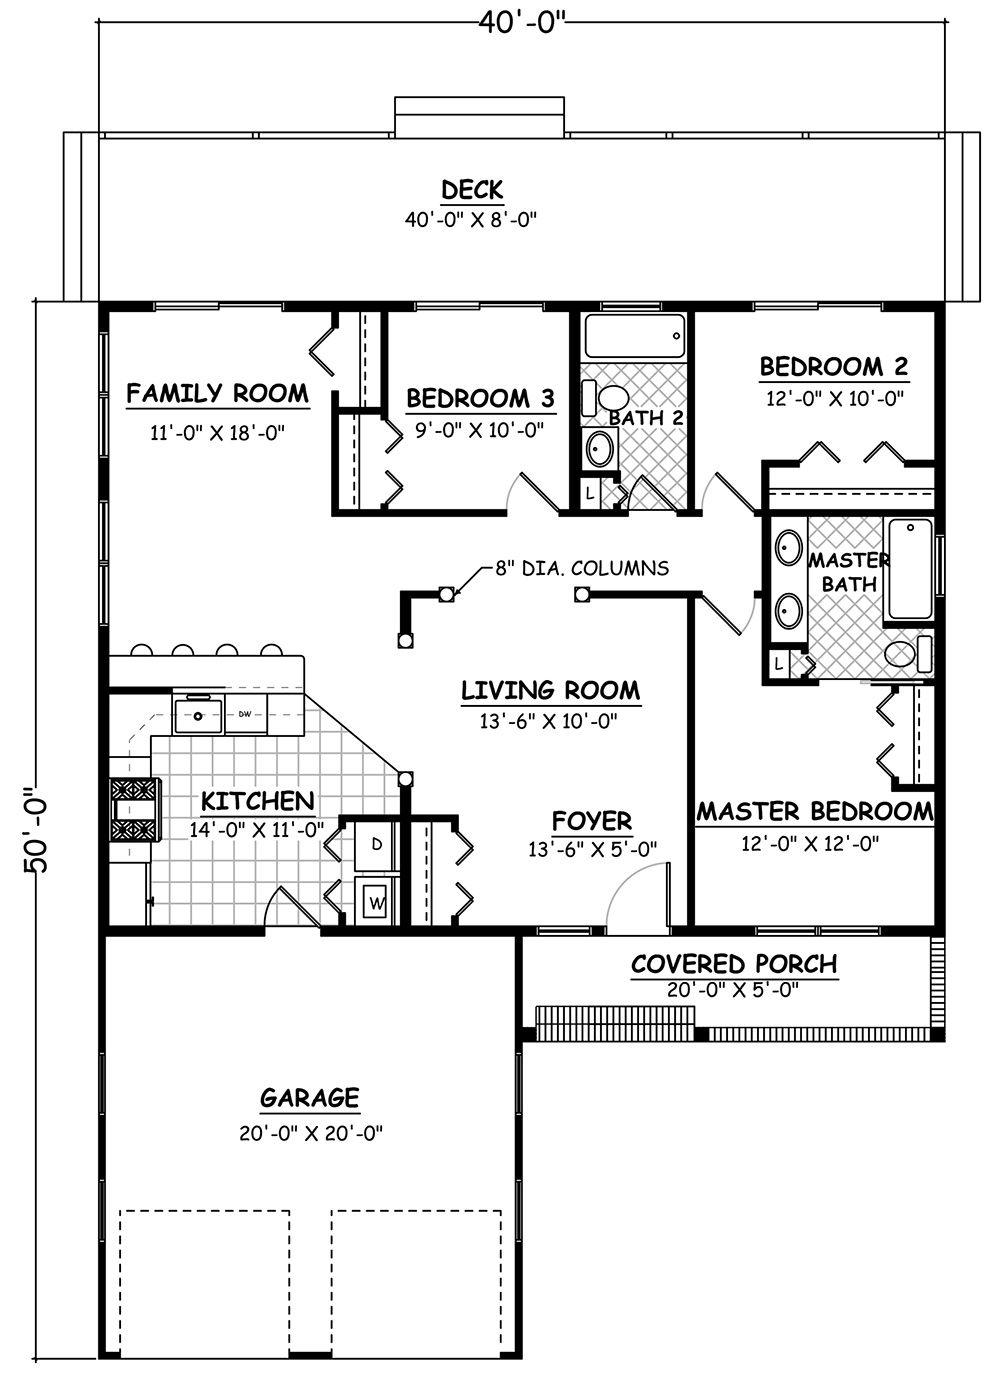 House Plan 52600079 Traditional Plan 1,200 Square Feet